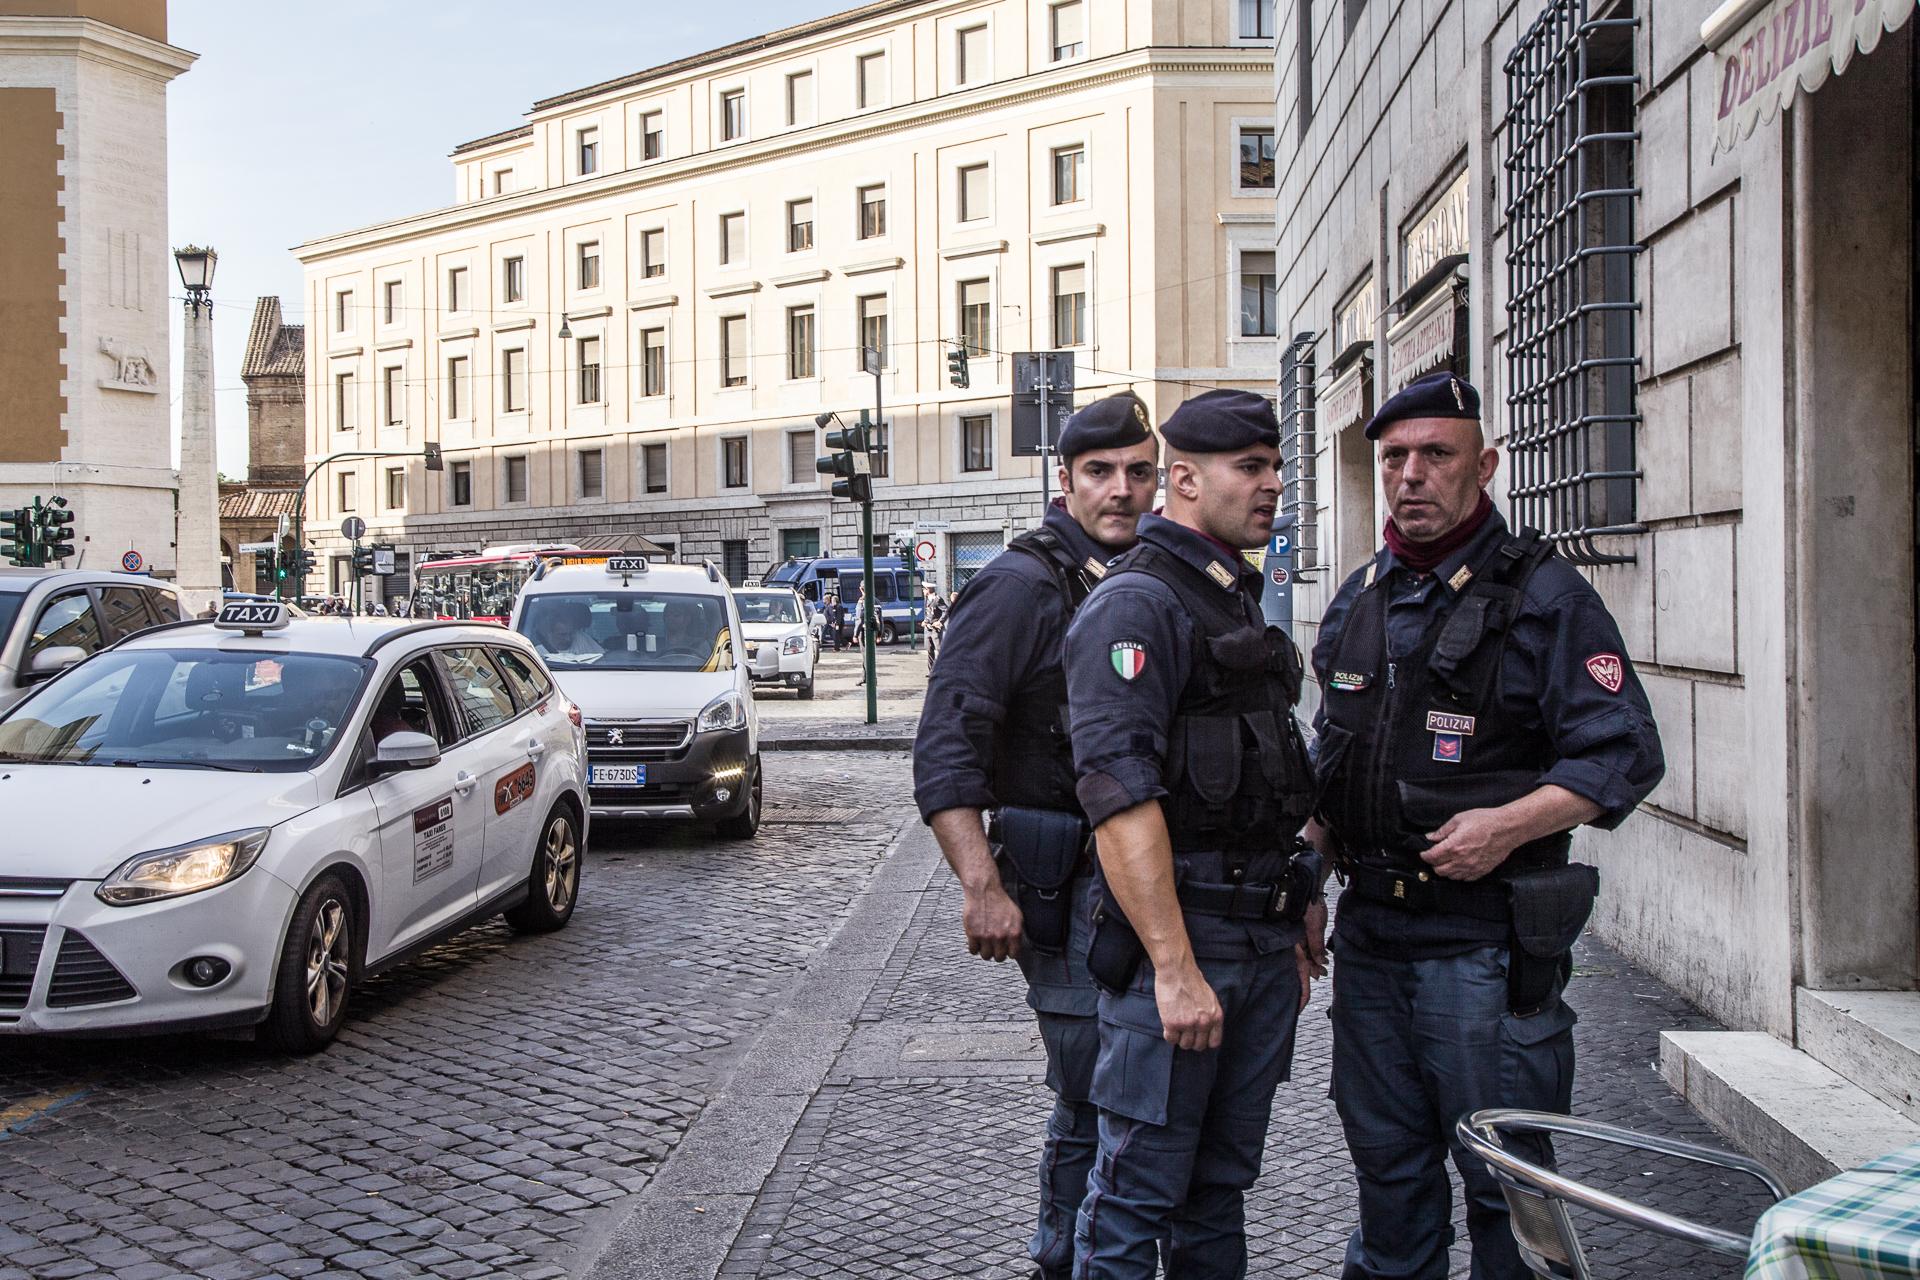 Roman Police